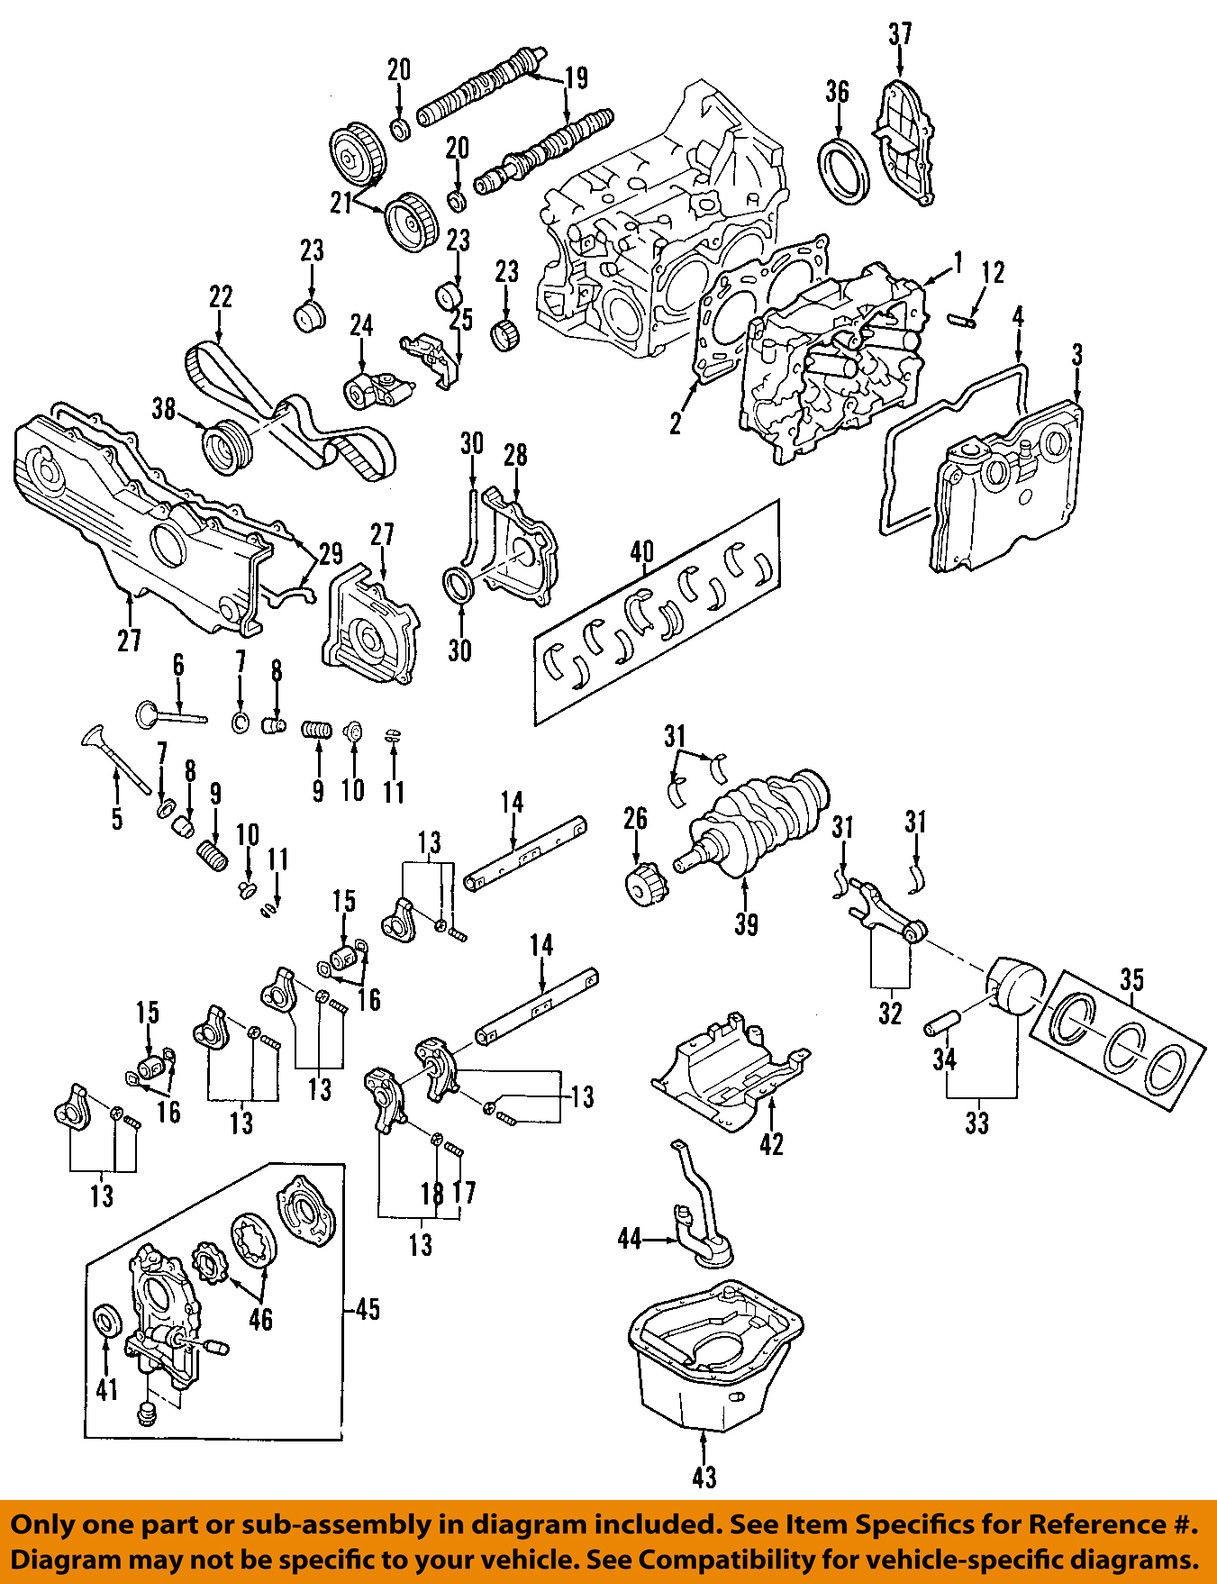 2015 Wrx Engine Diagram